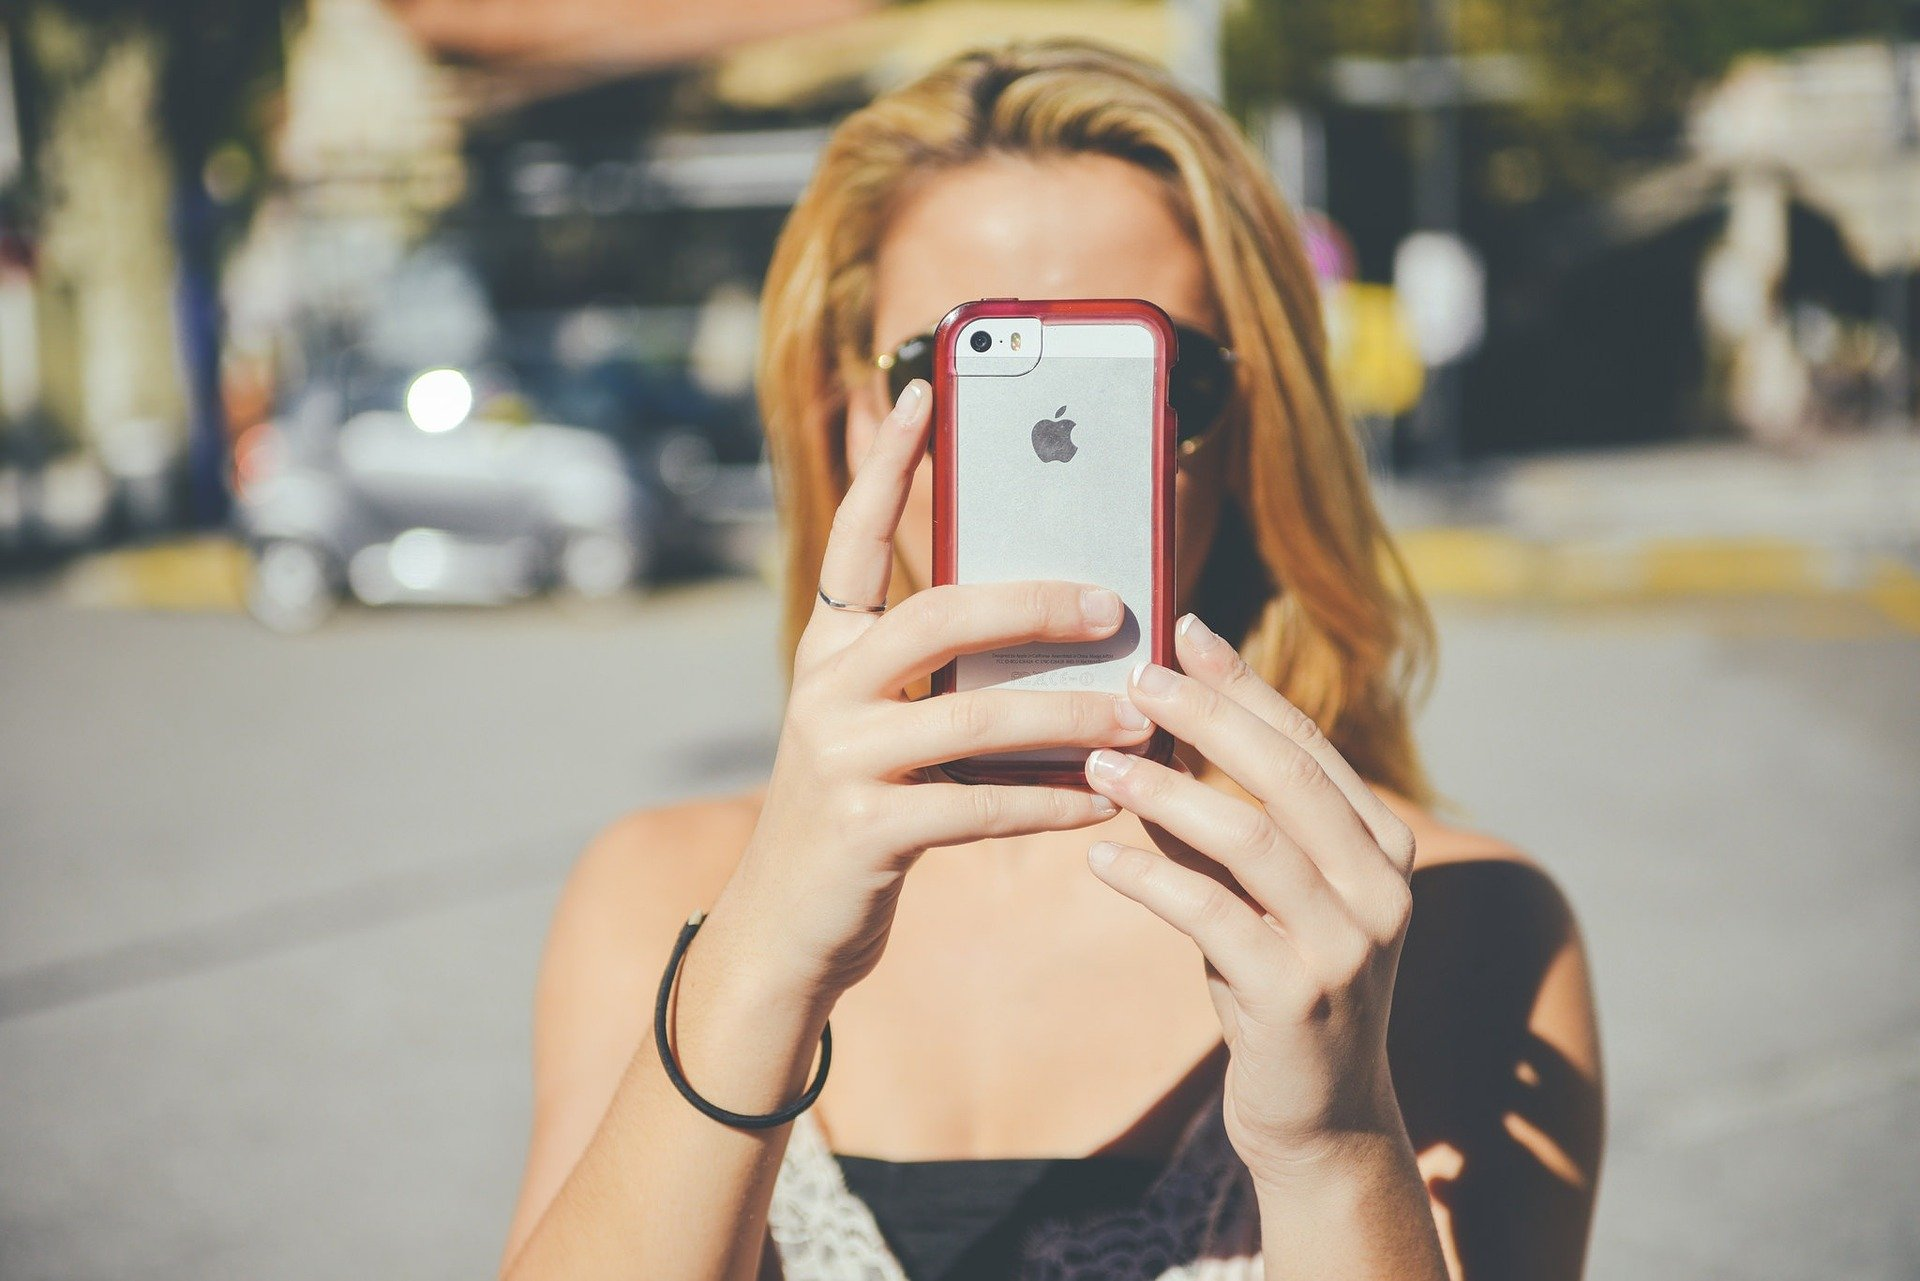 Fotokurs Smartphone fotografie